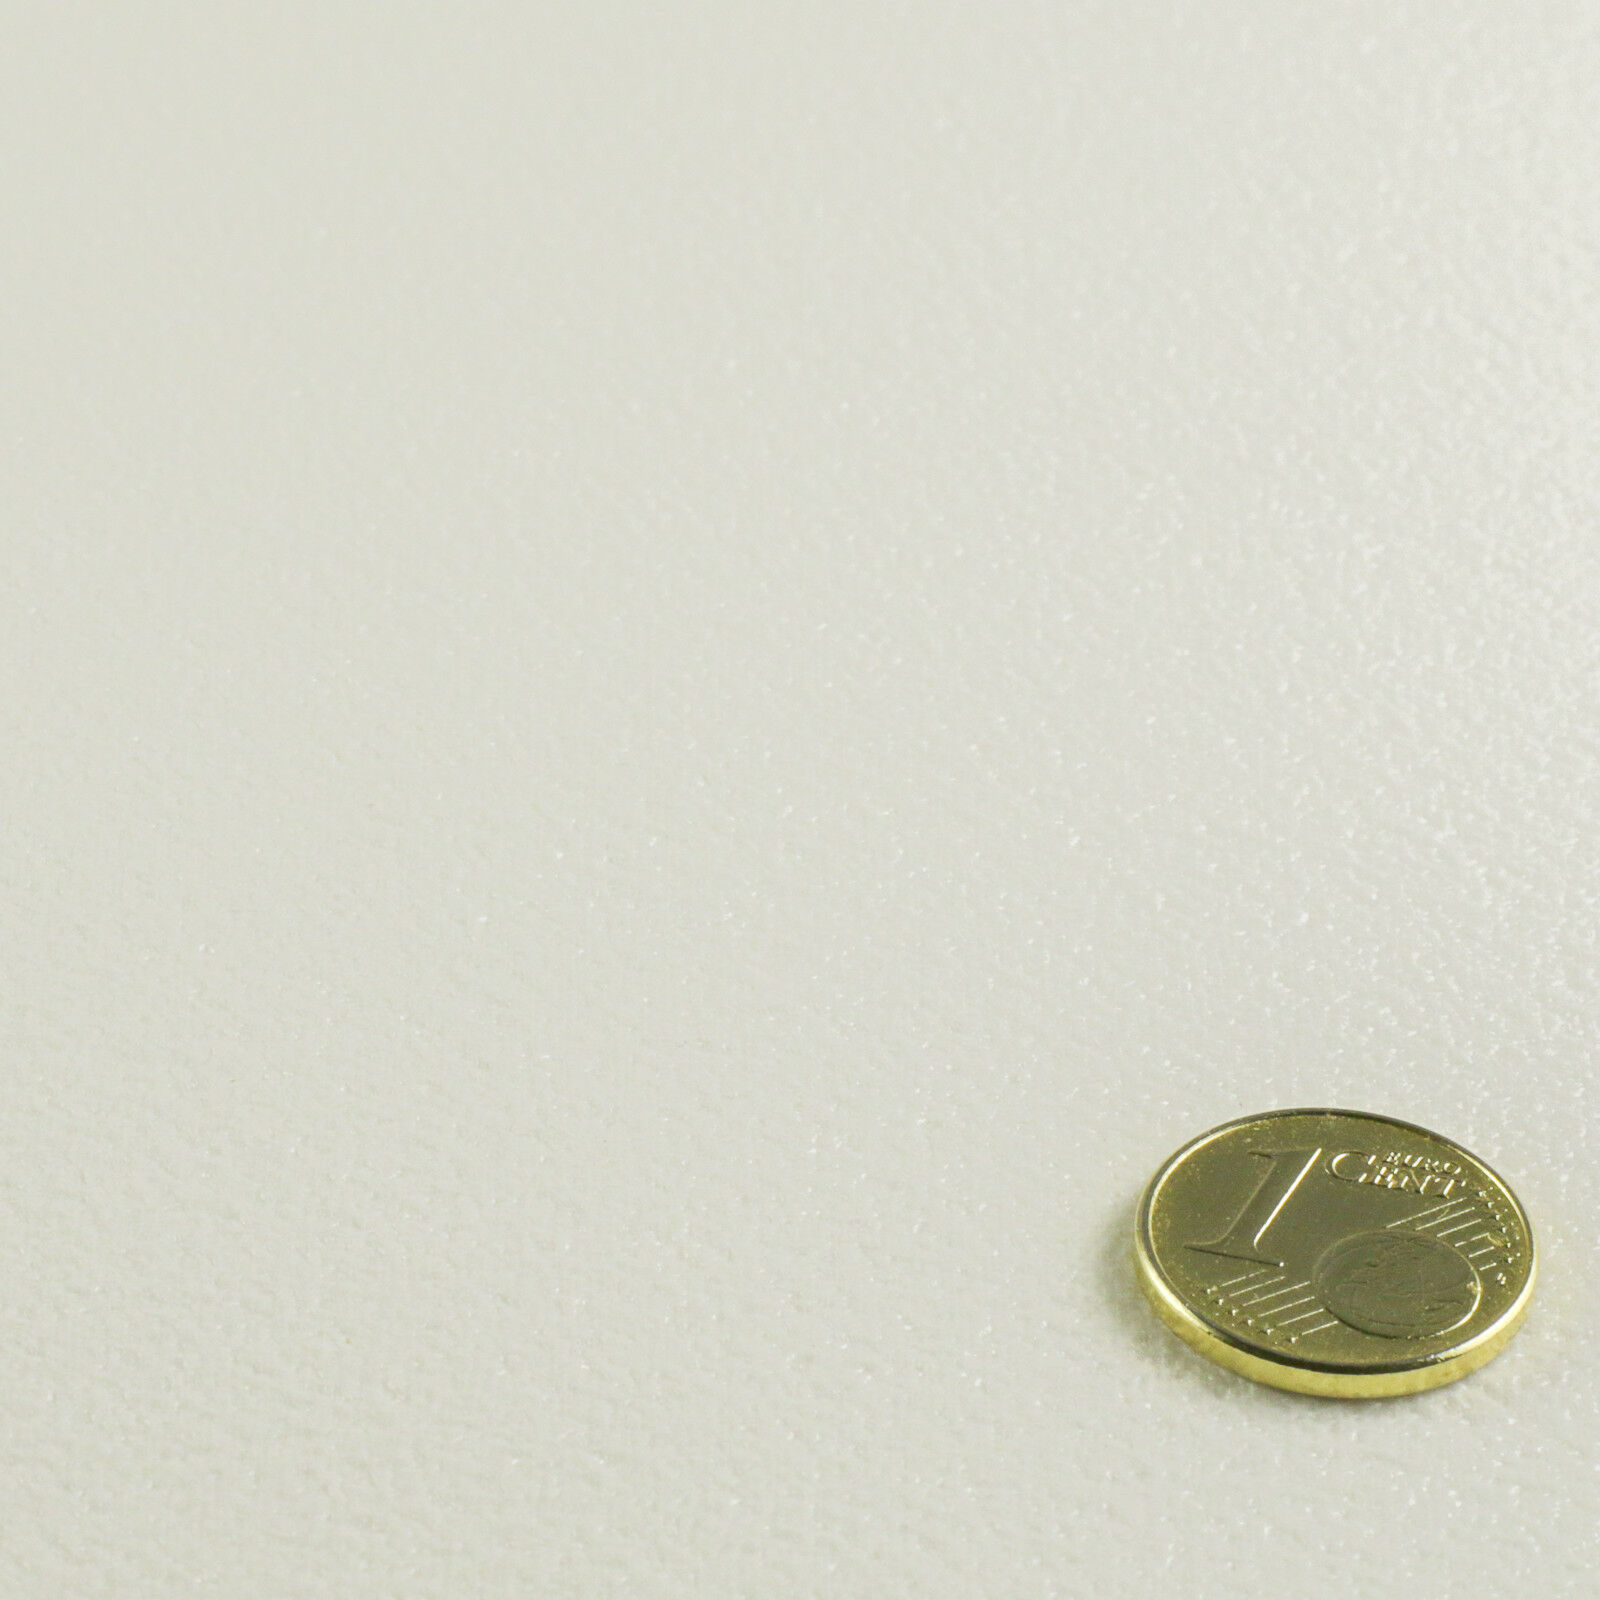 PVC Vinyl Bodenbelag Einfarbig Uni Weiß Breite 2 m - 1m²/